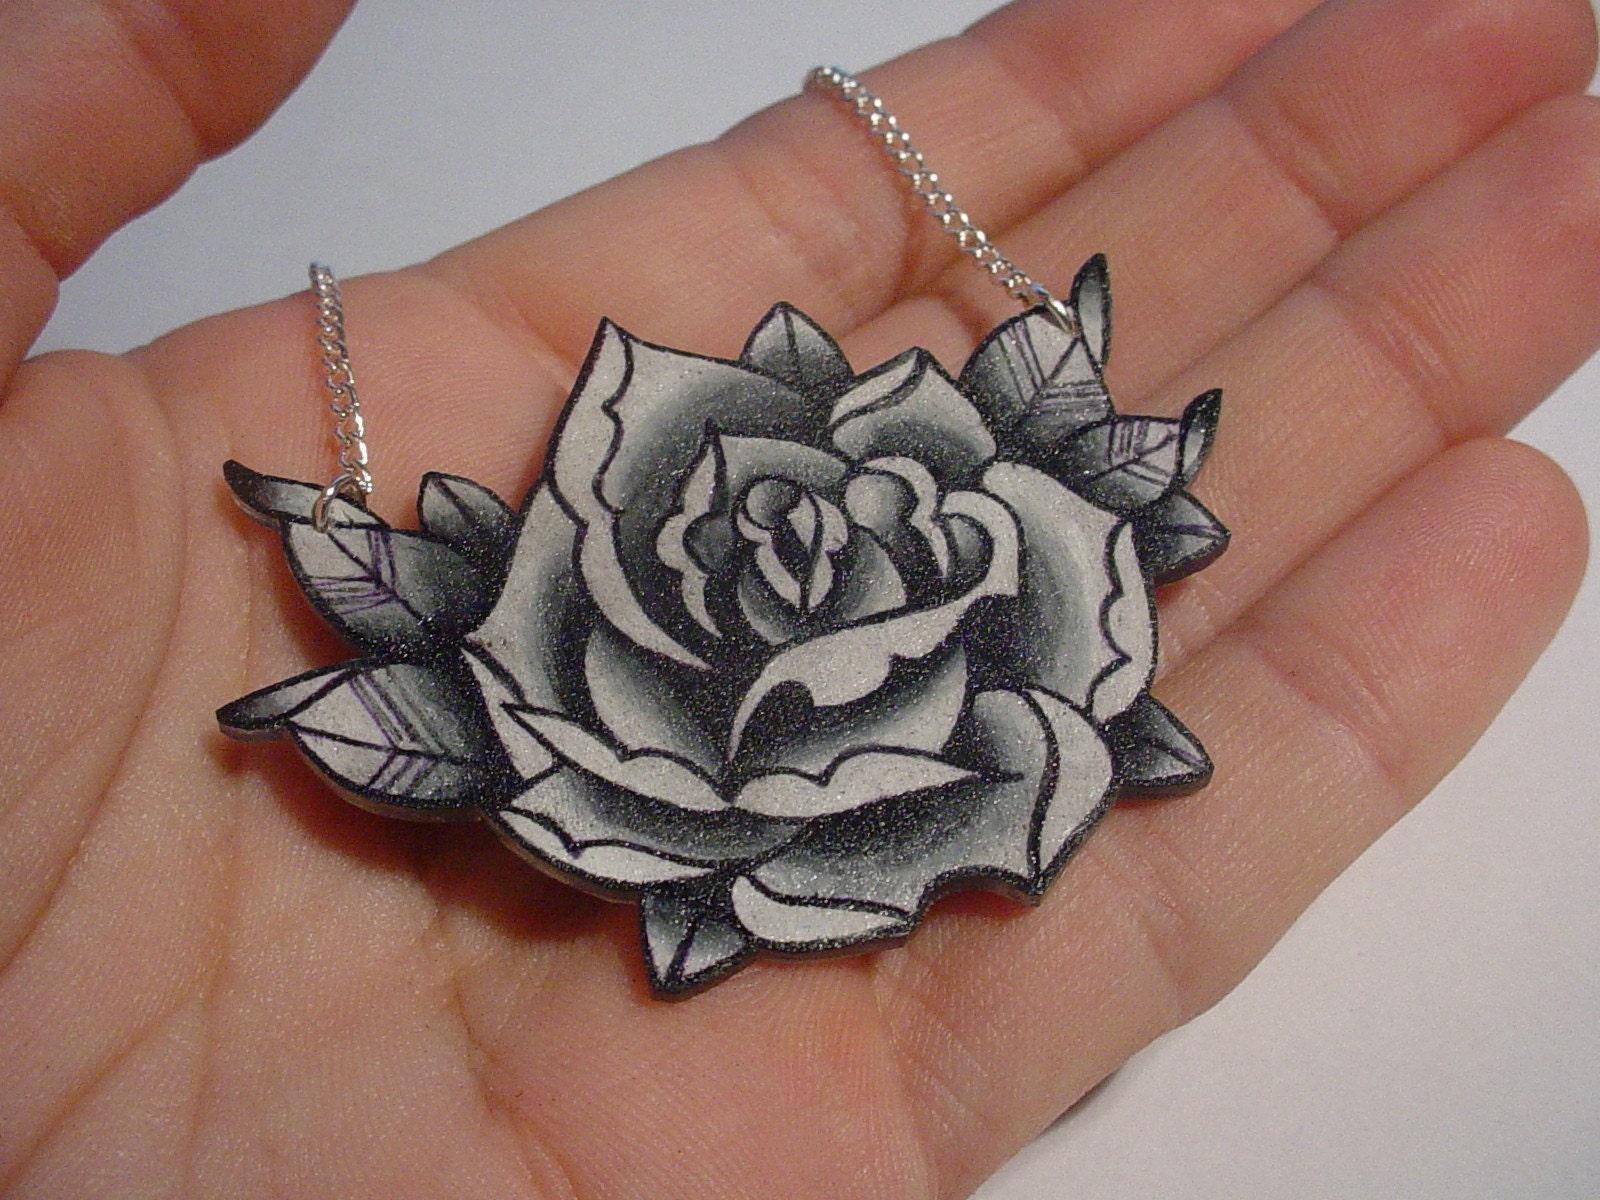 Rose tattoo rose tattoo design tattoo addicted for Tattoos of roses